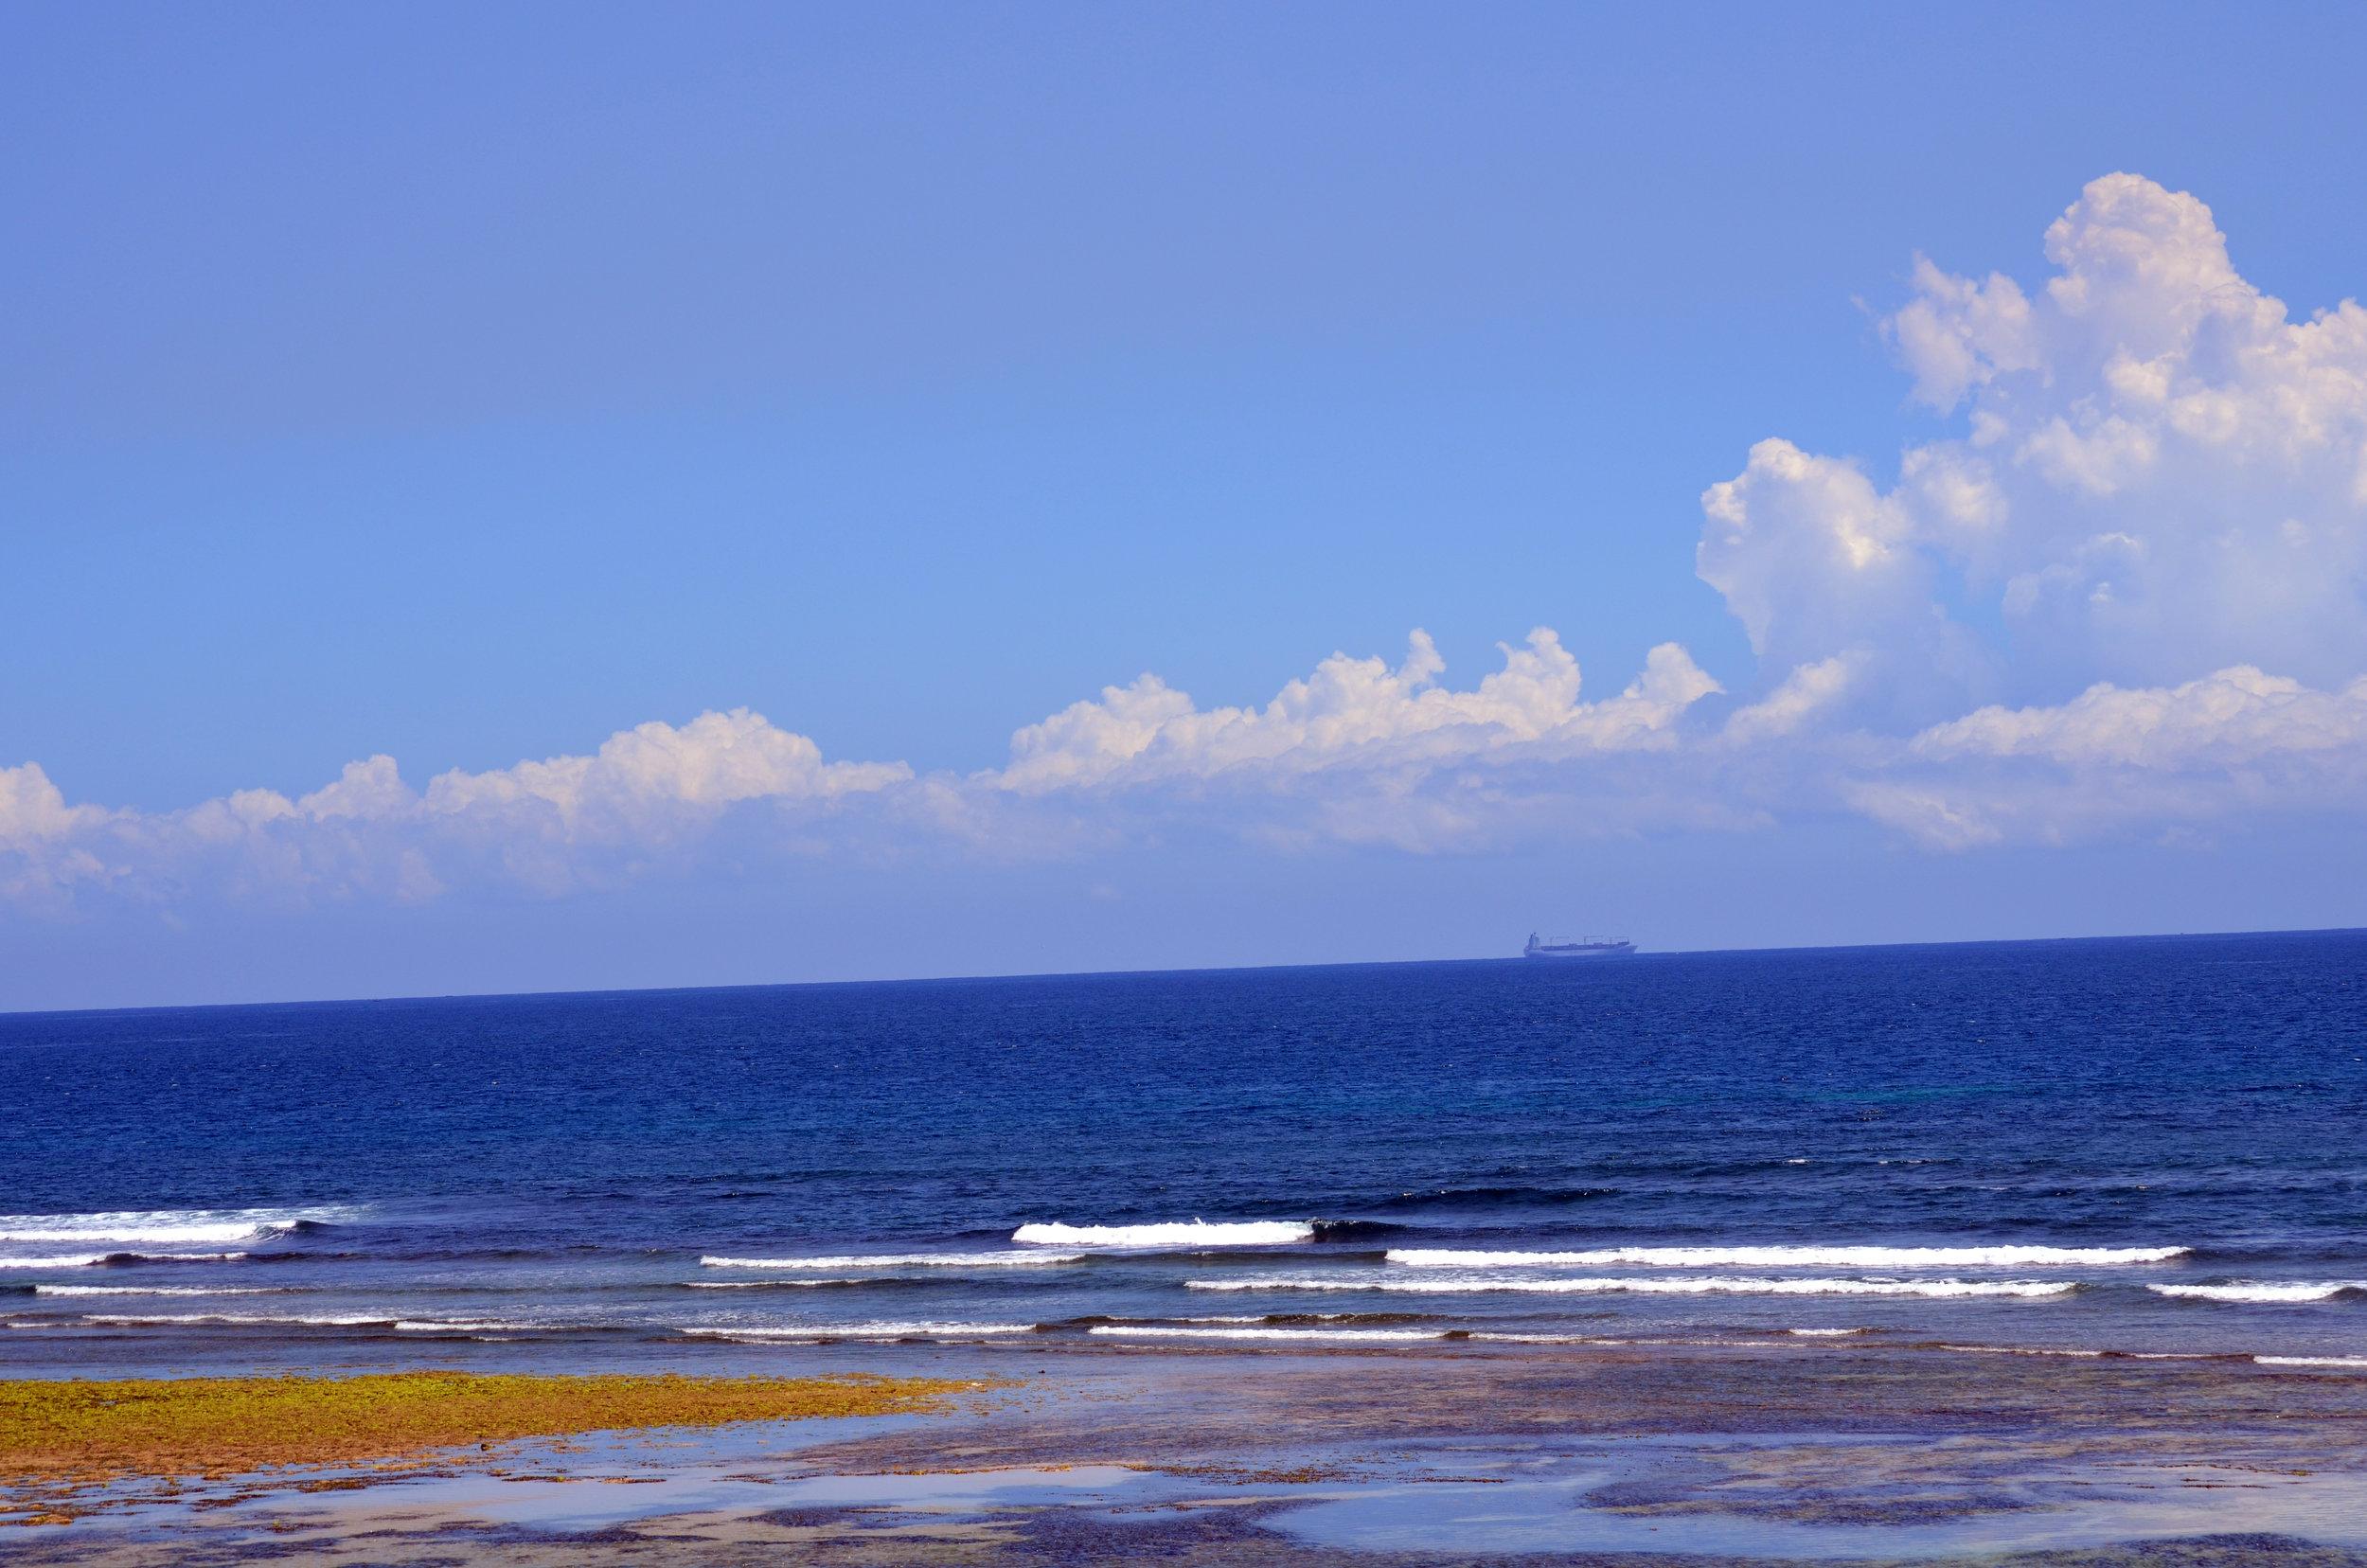 Copy of Indian Ocrean from the shore of Dar es Salaam (AF013)